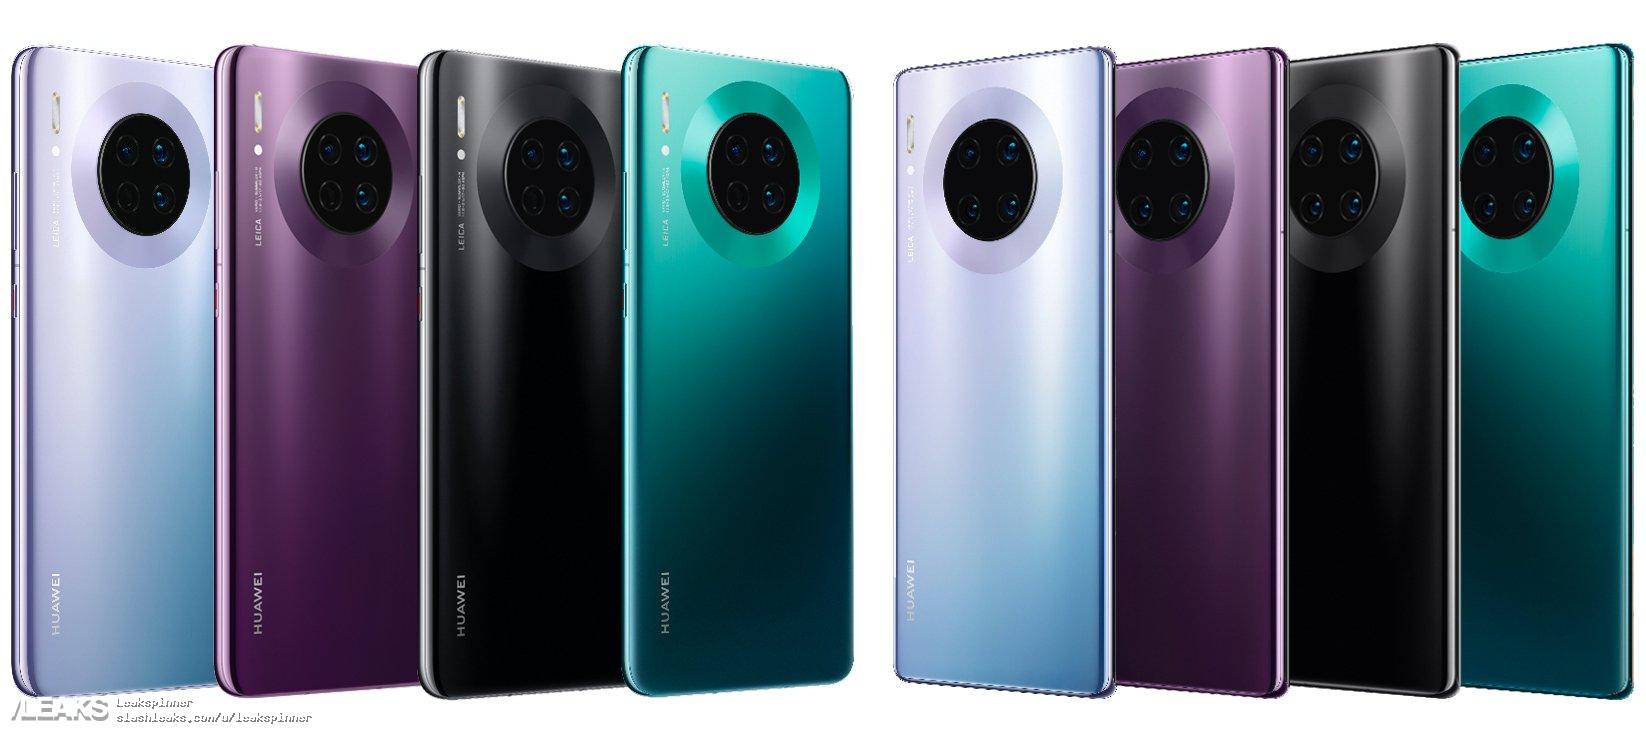 Huawei's P40 may come worldwide despite Google ban